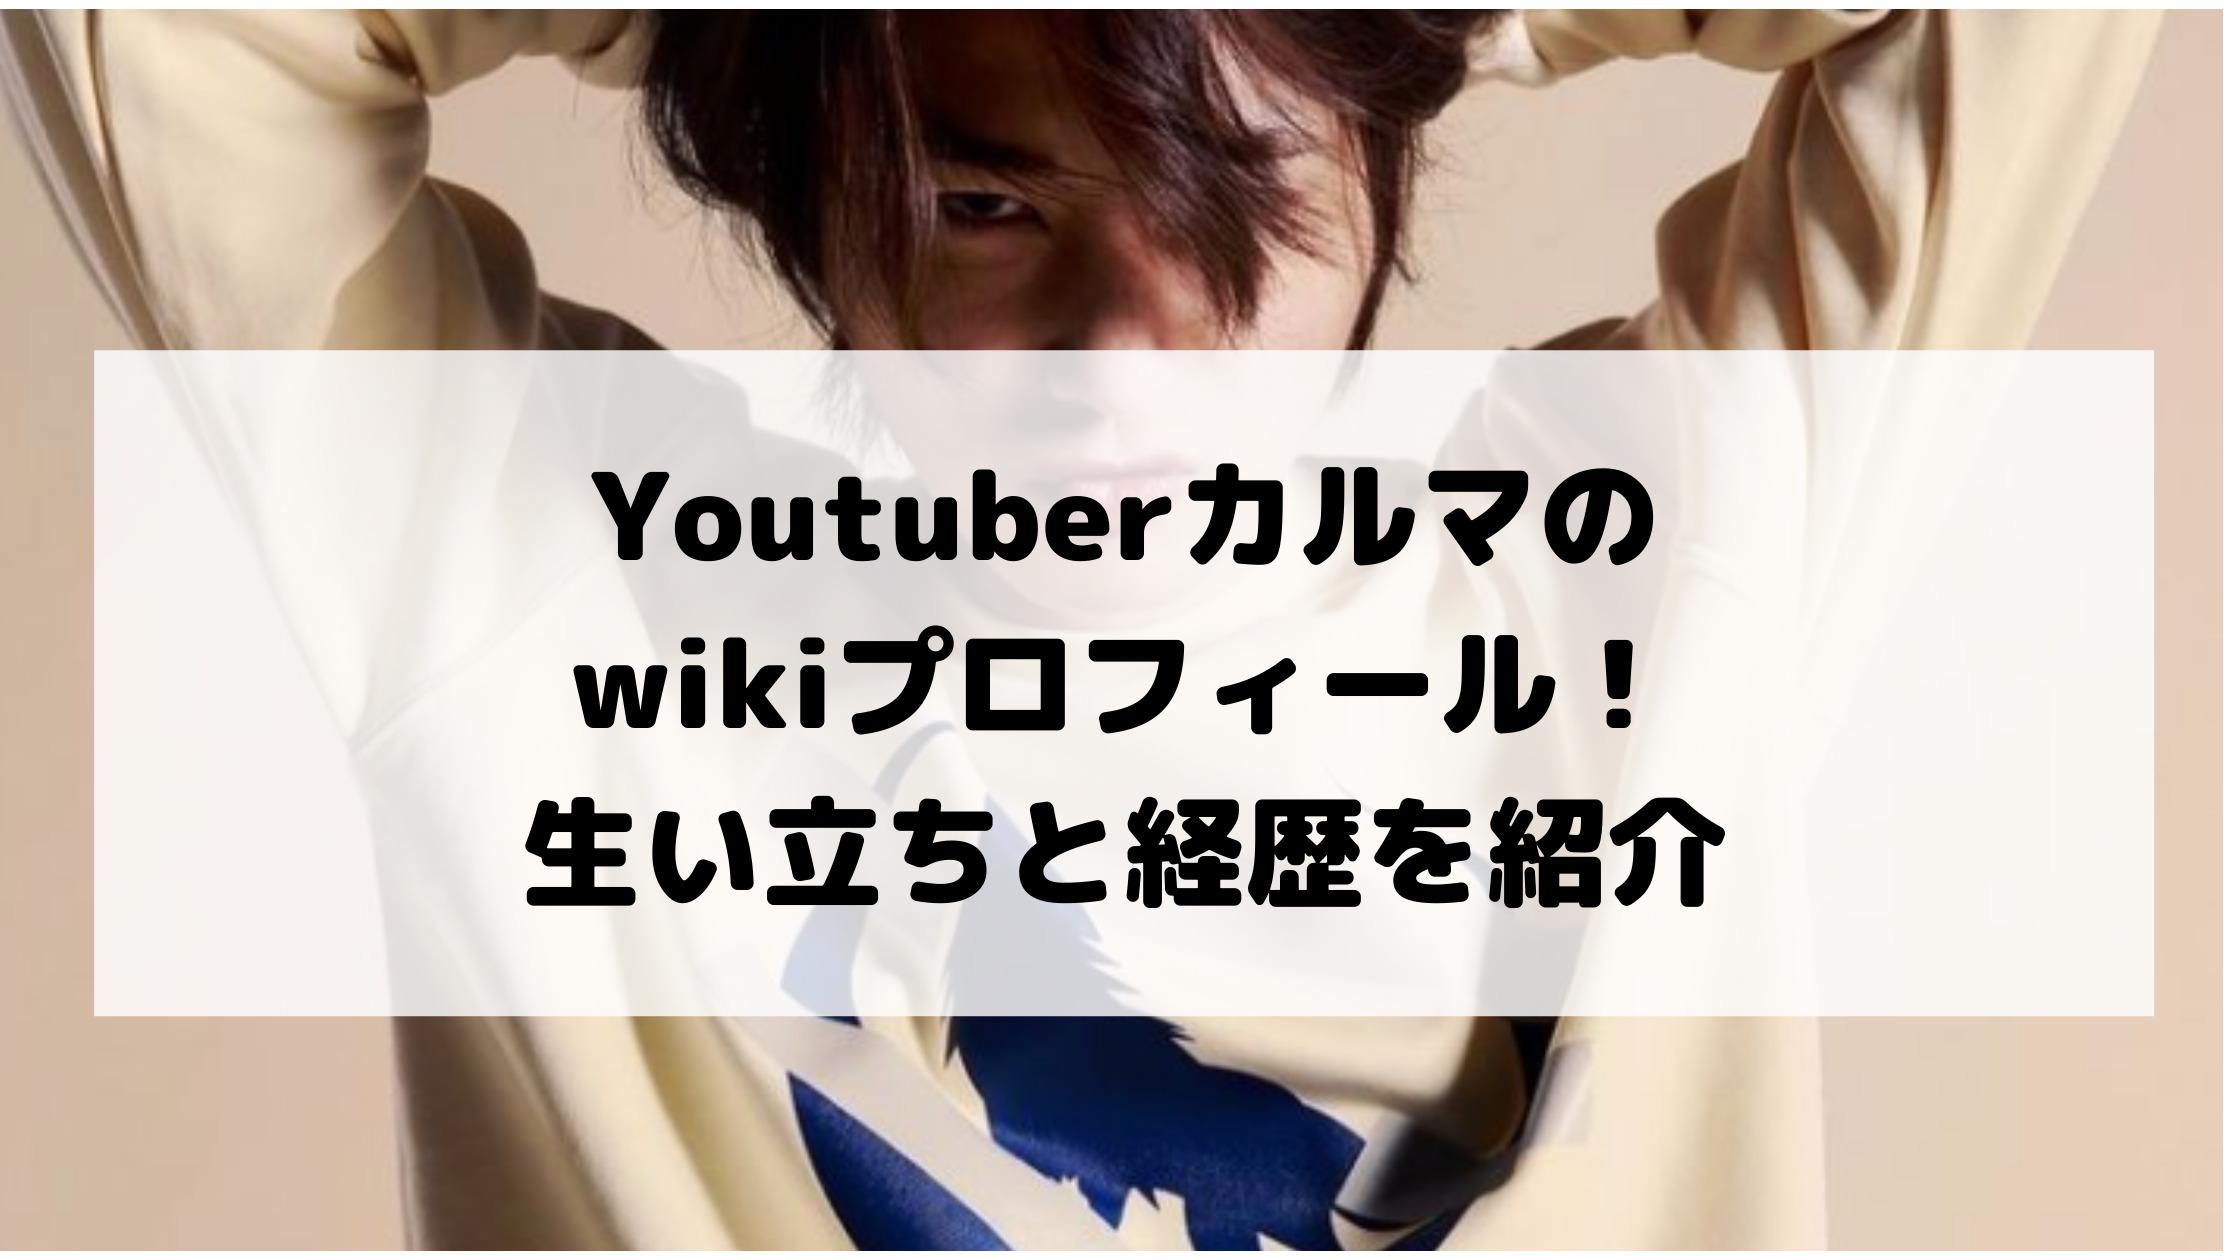 Youtuberカルマのwikiプロフィール!生い立ちと経歴を紹介